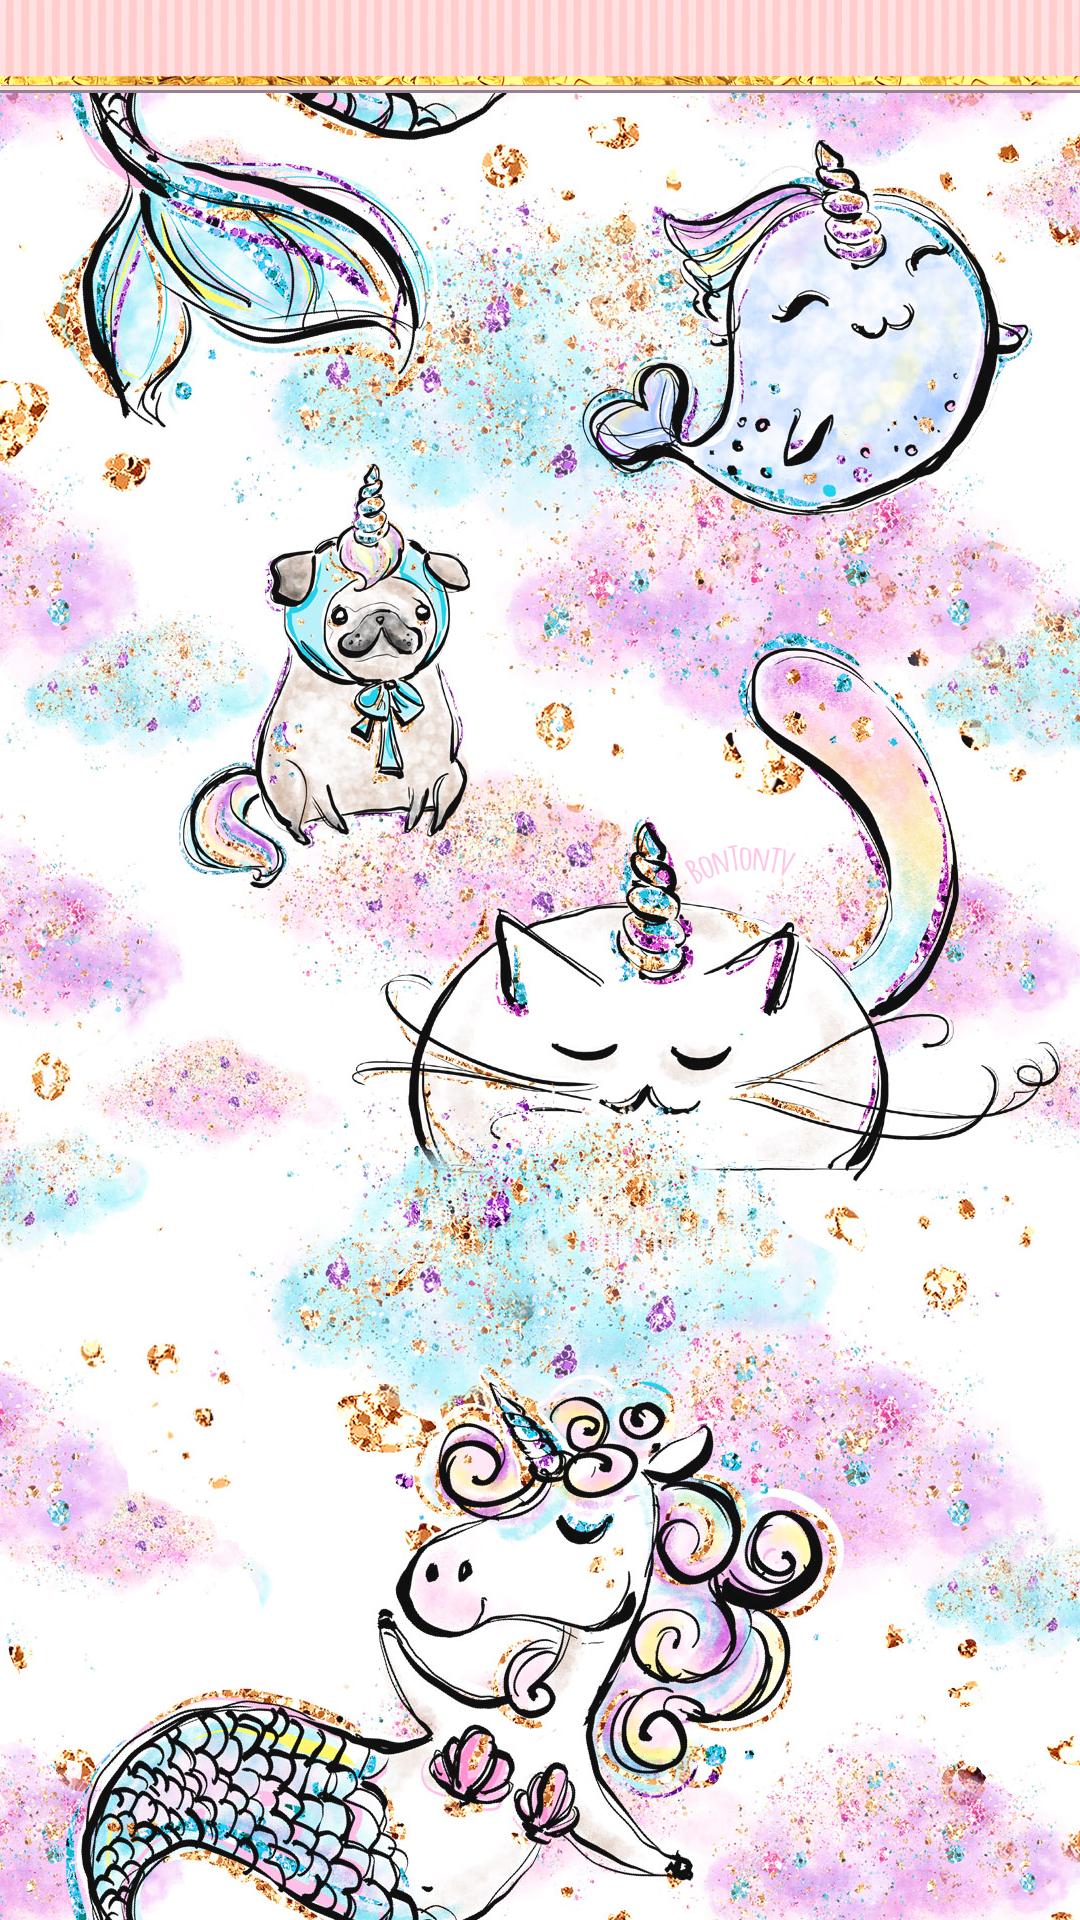 Phone Wallpapers Hd Cute Unicorn Glitter Art By Bonton Tv Free